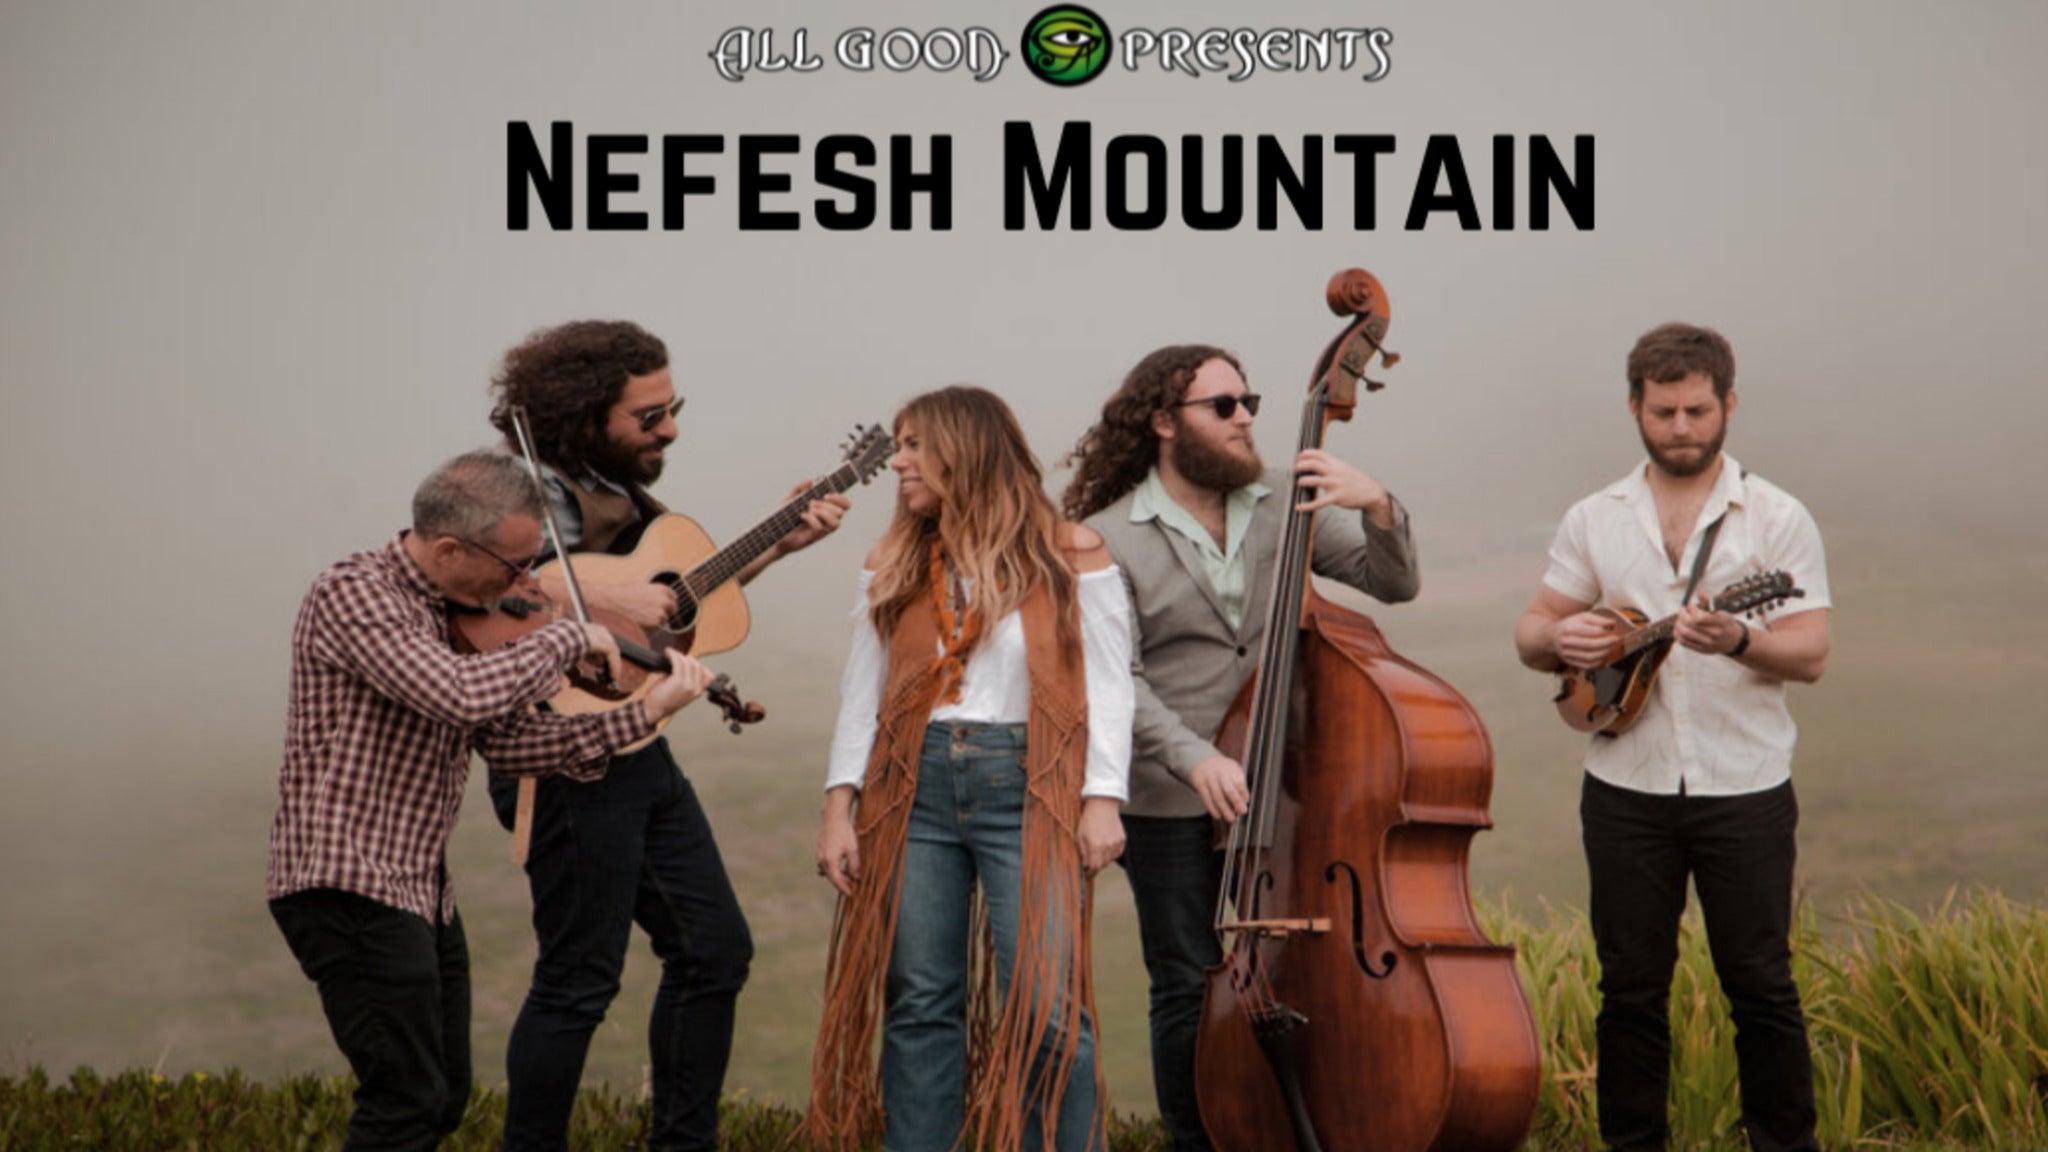 All Good Presents - Nefesh Mountain